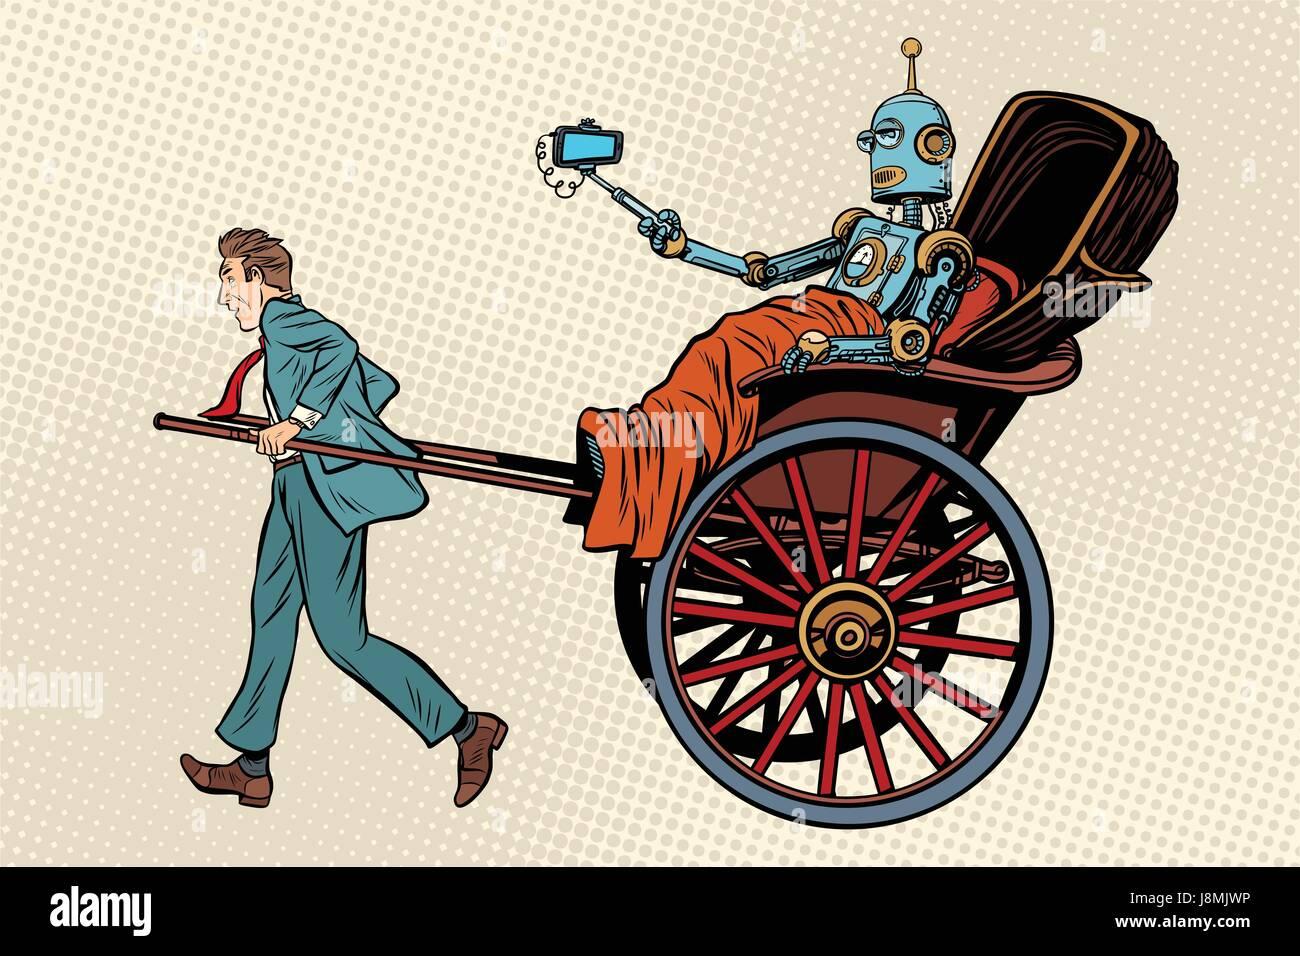 People rickshaw ride robot Stock Vector